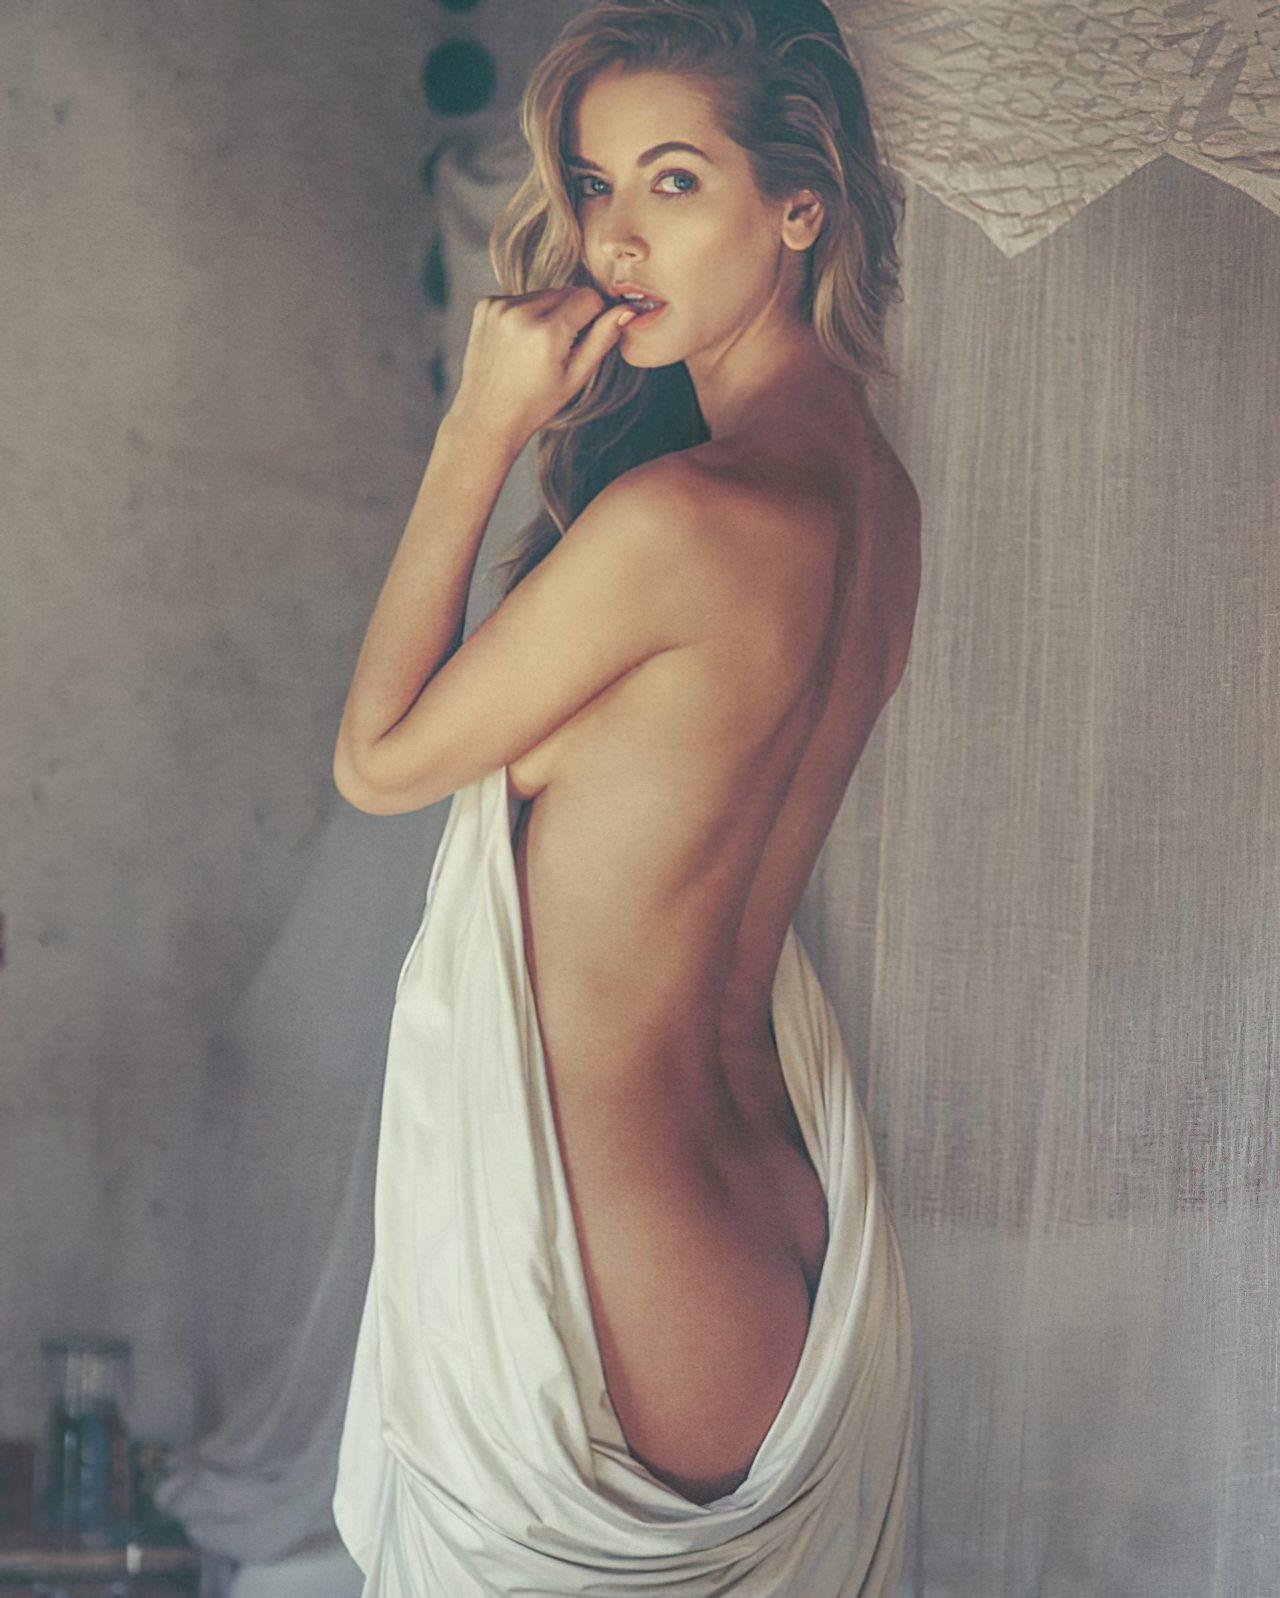 Fotos Mulheres Nuas (28)